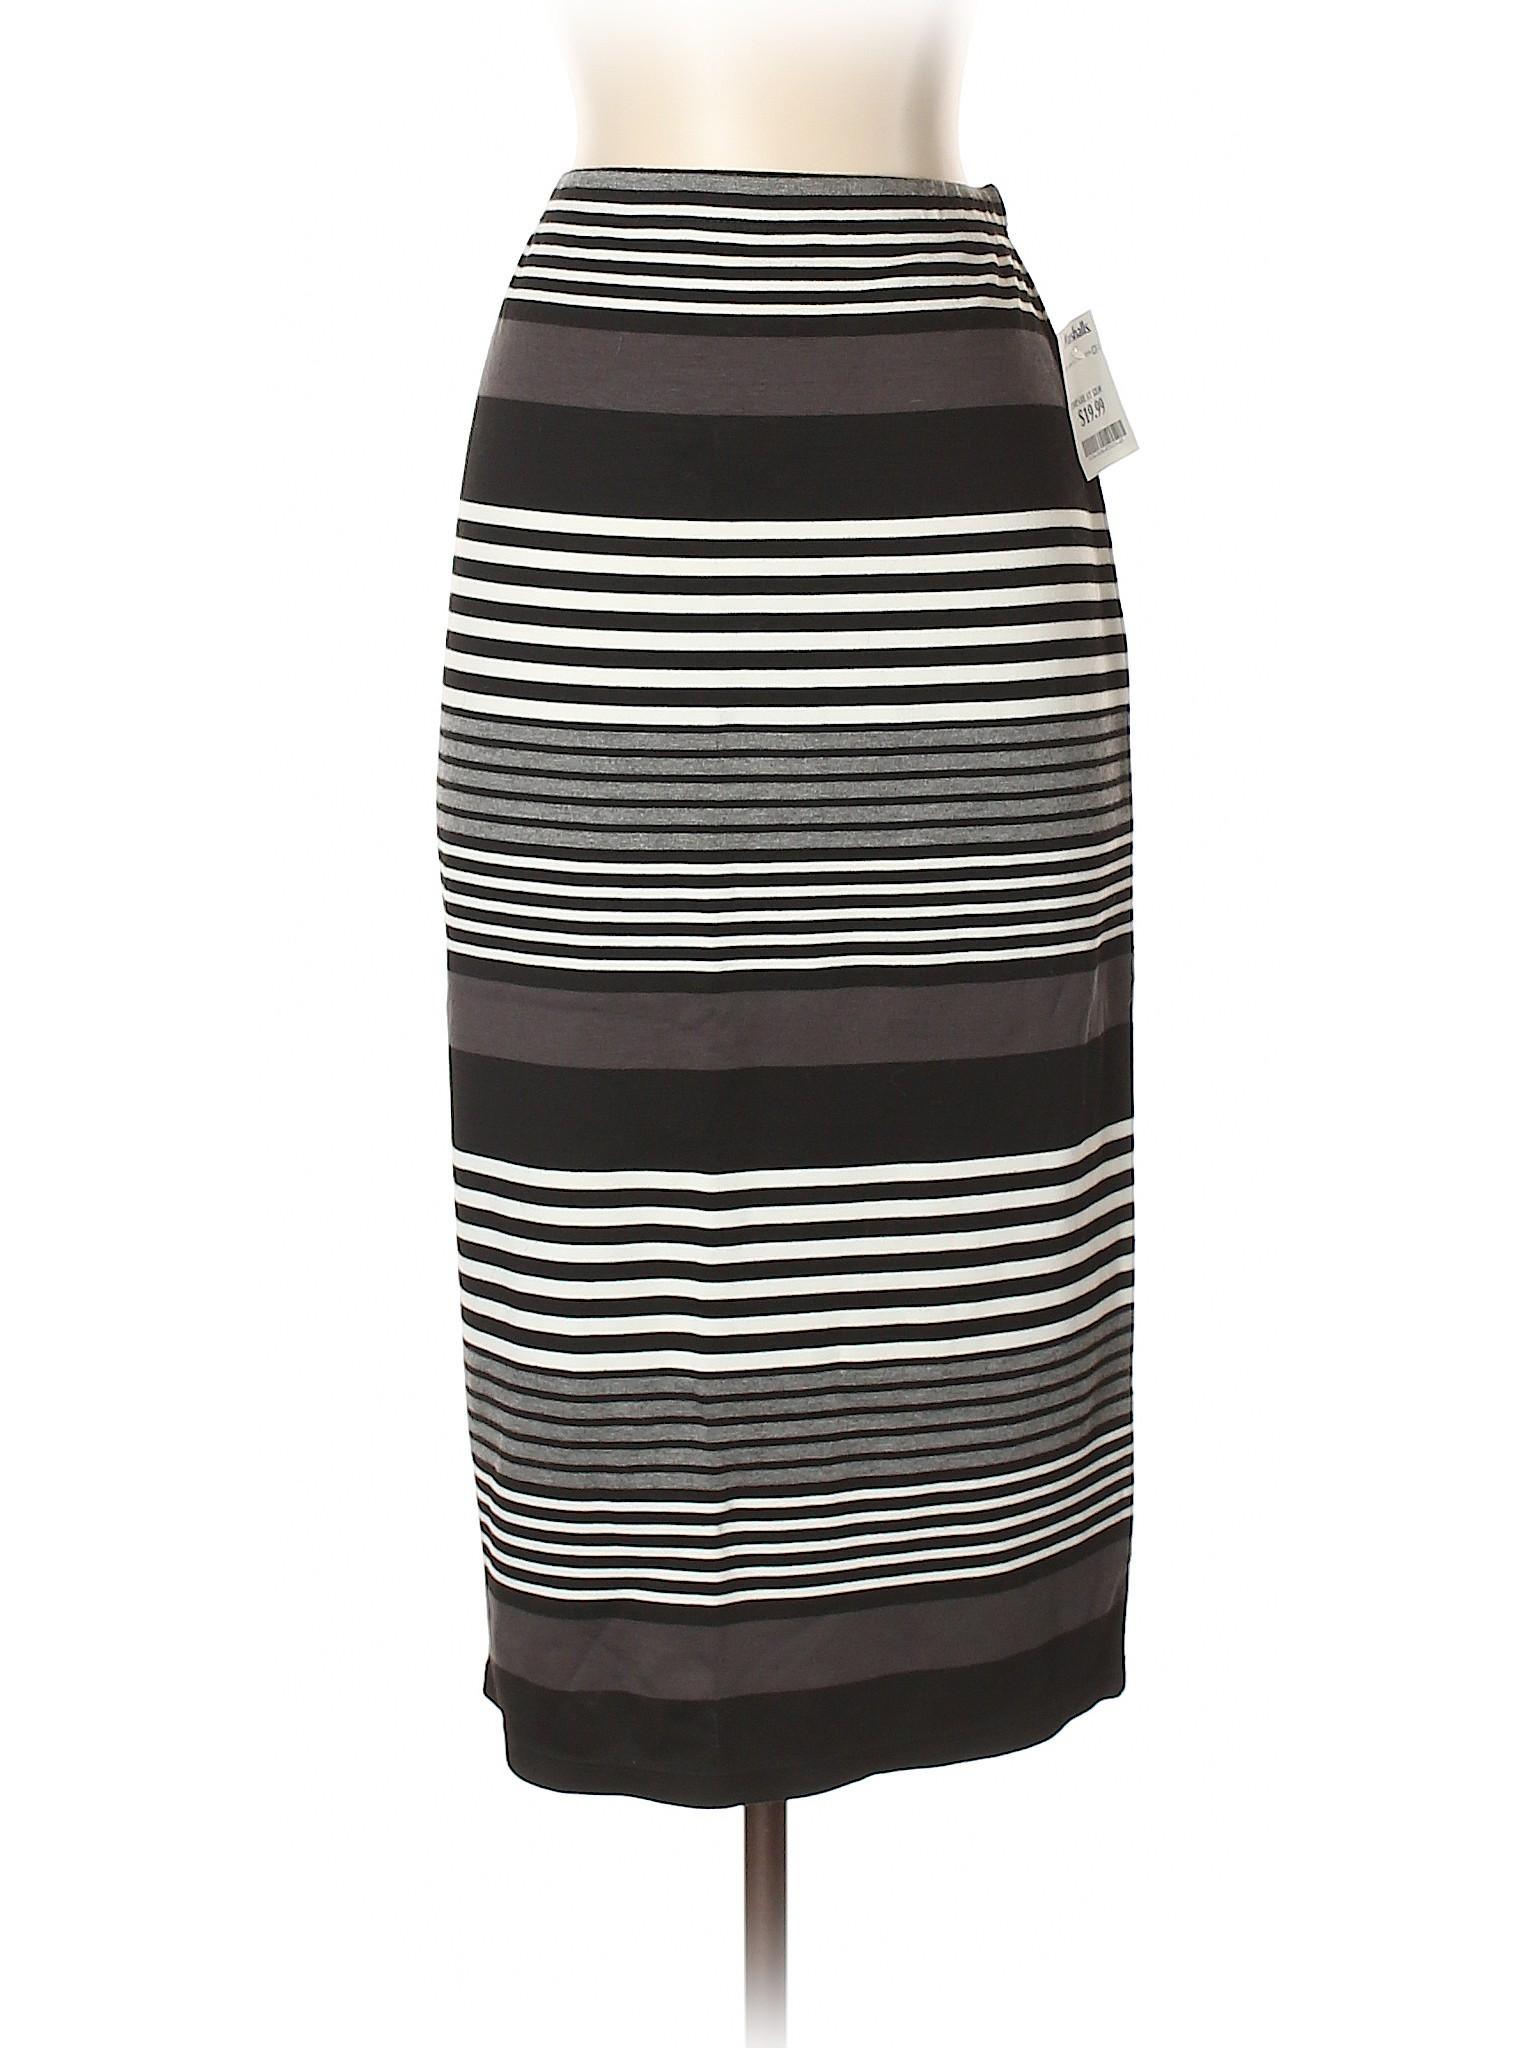 Casual Casual Boutique Skirt Boutique Skirt Boutique Skirt Casual SdqgxRT